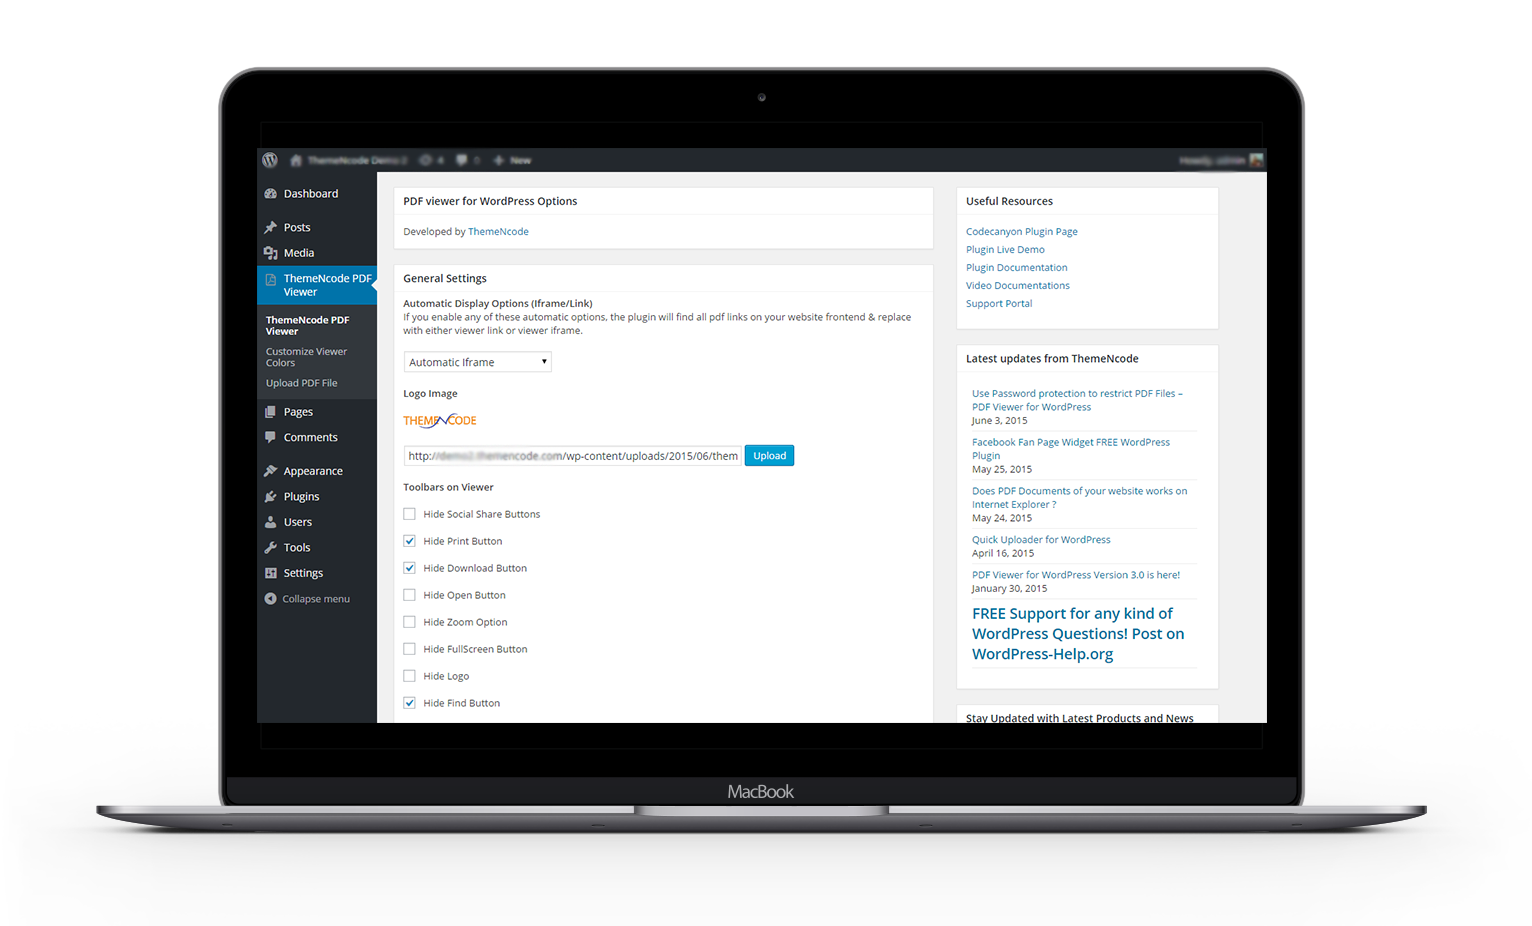 PDF viewer for WordPress - 1